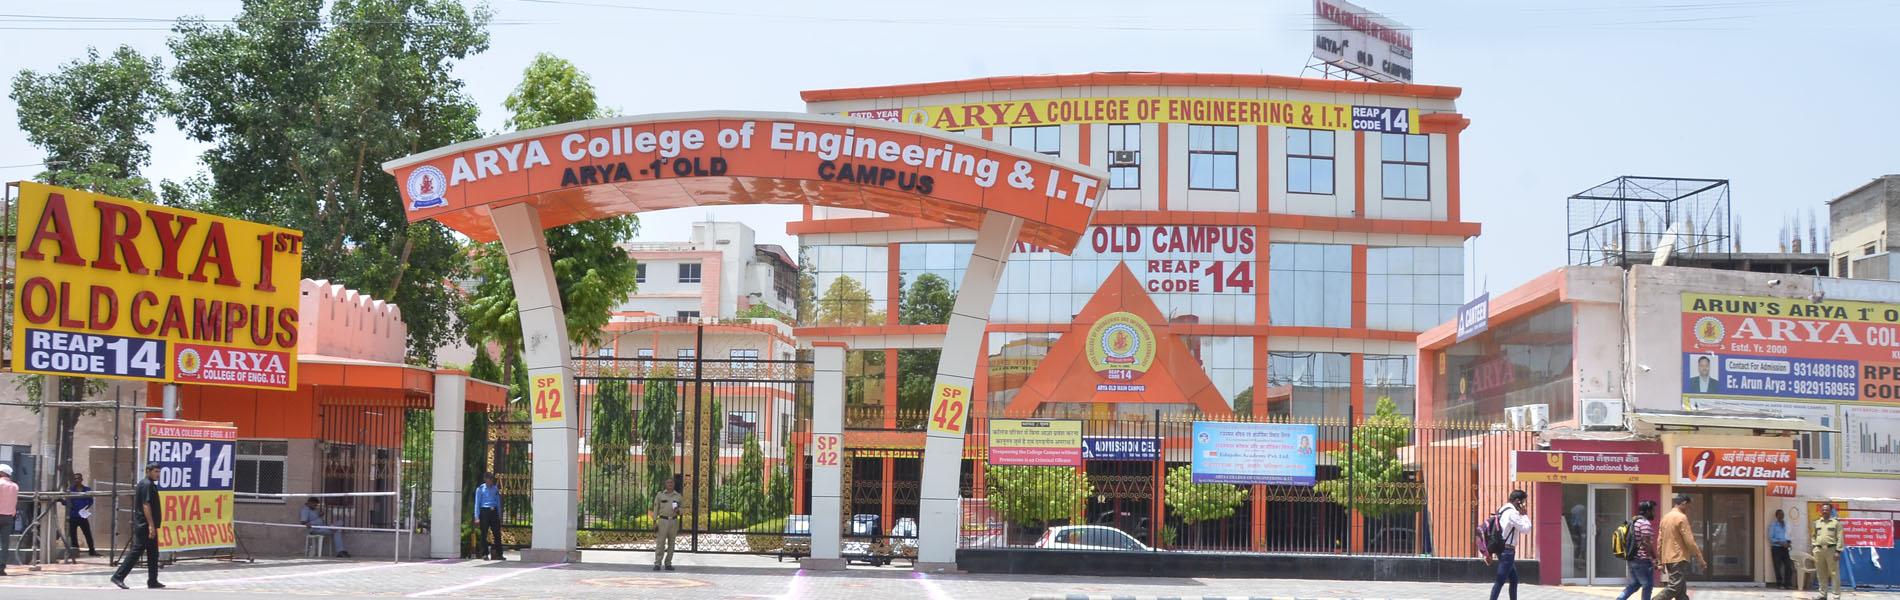 arya-college-jaipur, Arya Logo, Arya College of Engineering and iT, Arya 1st Old Campus, Arya SP42, Arya College Jaipur, Arya College, ACEIT, Best Engineering College in Rajasthan, Arya Kukas, Arya Jaipur, Top 5 Engineering College in Rajasthan